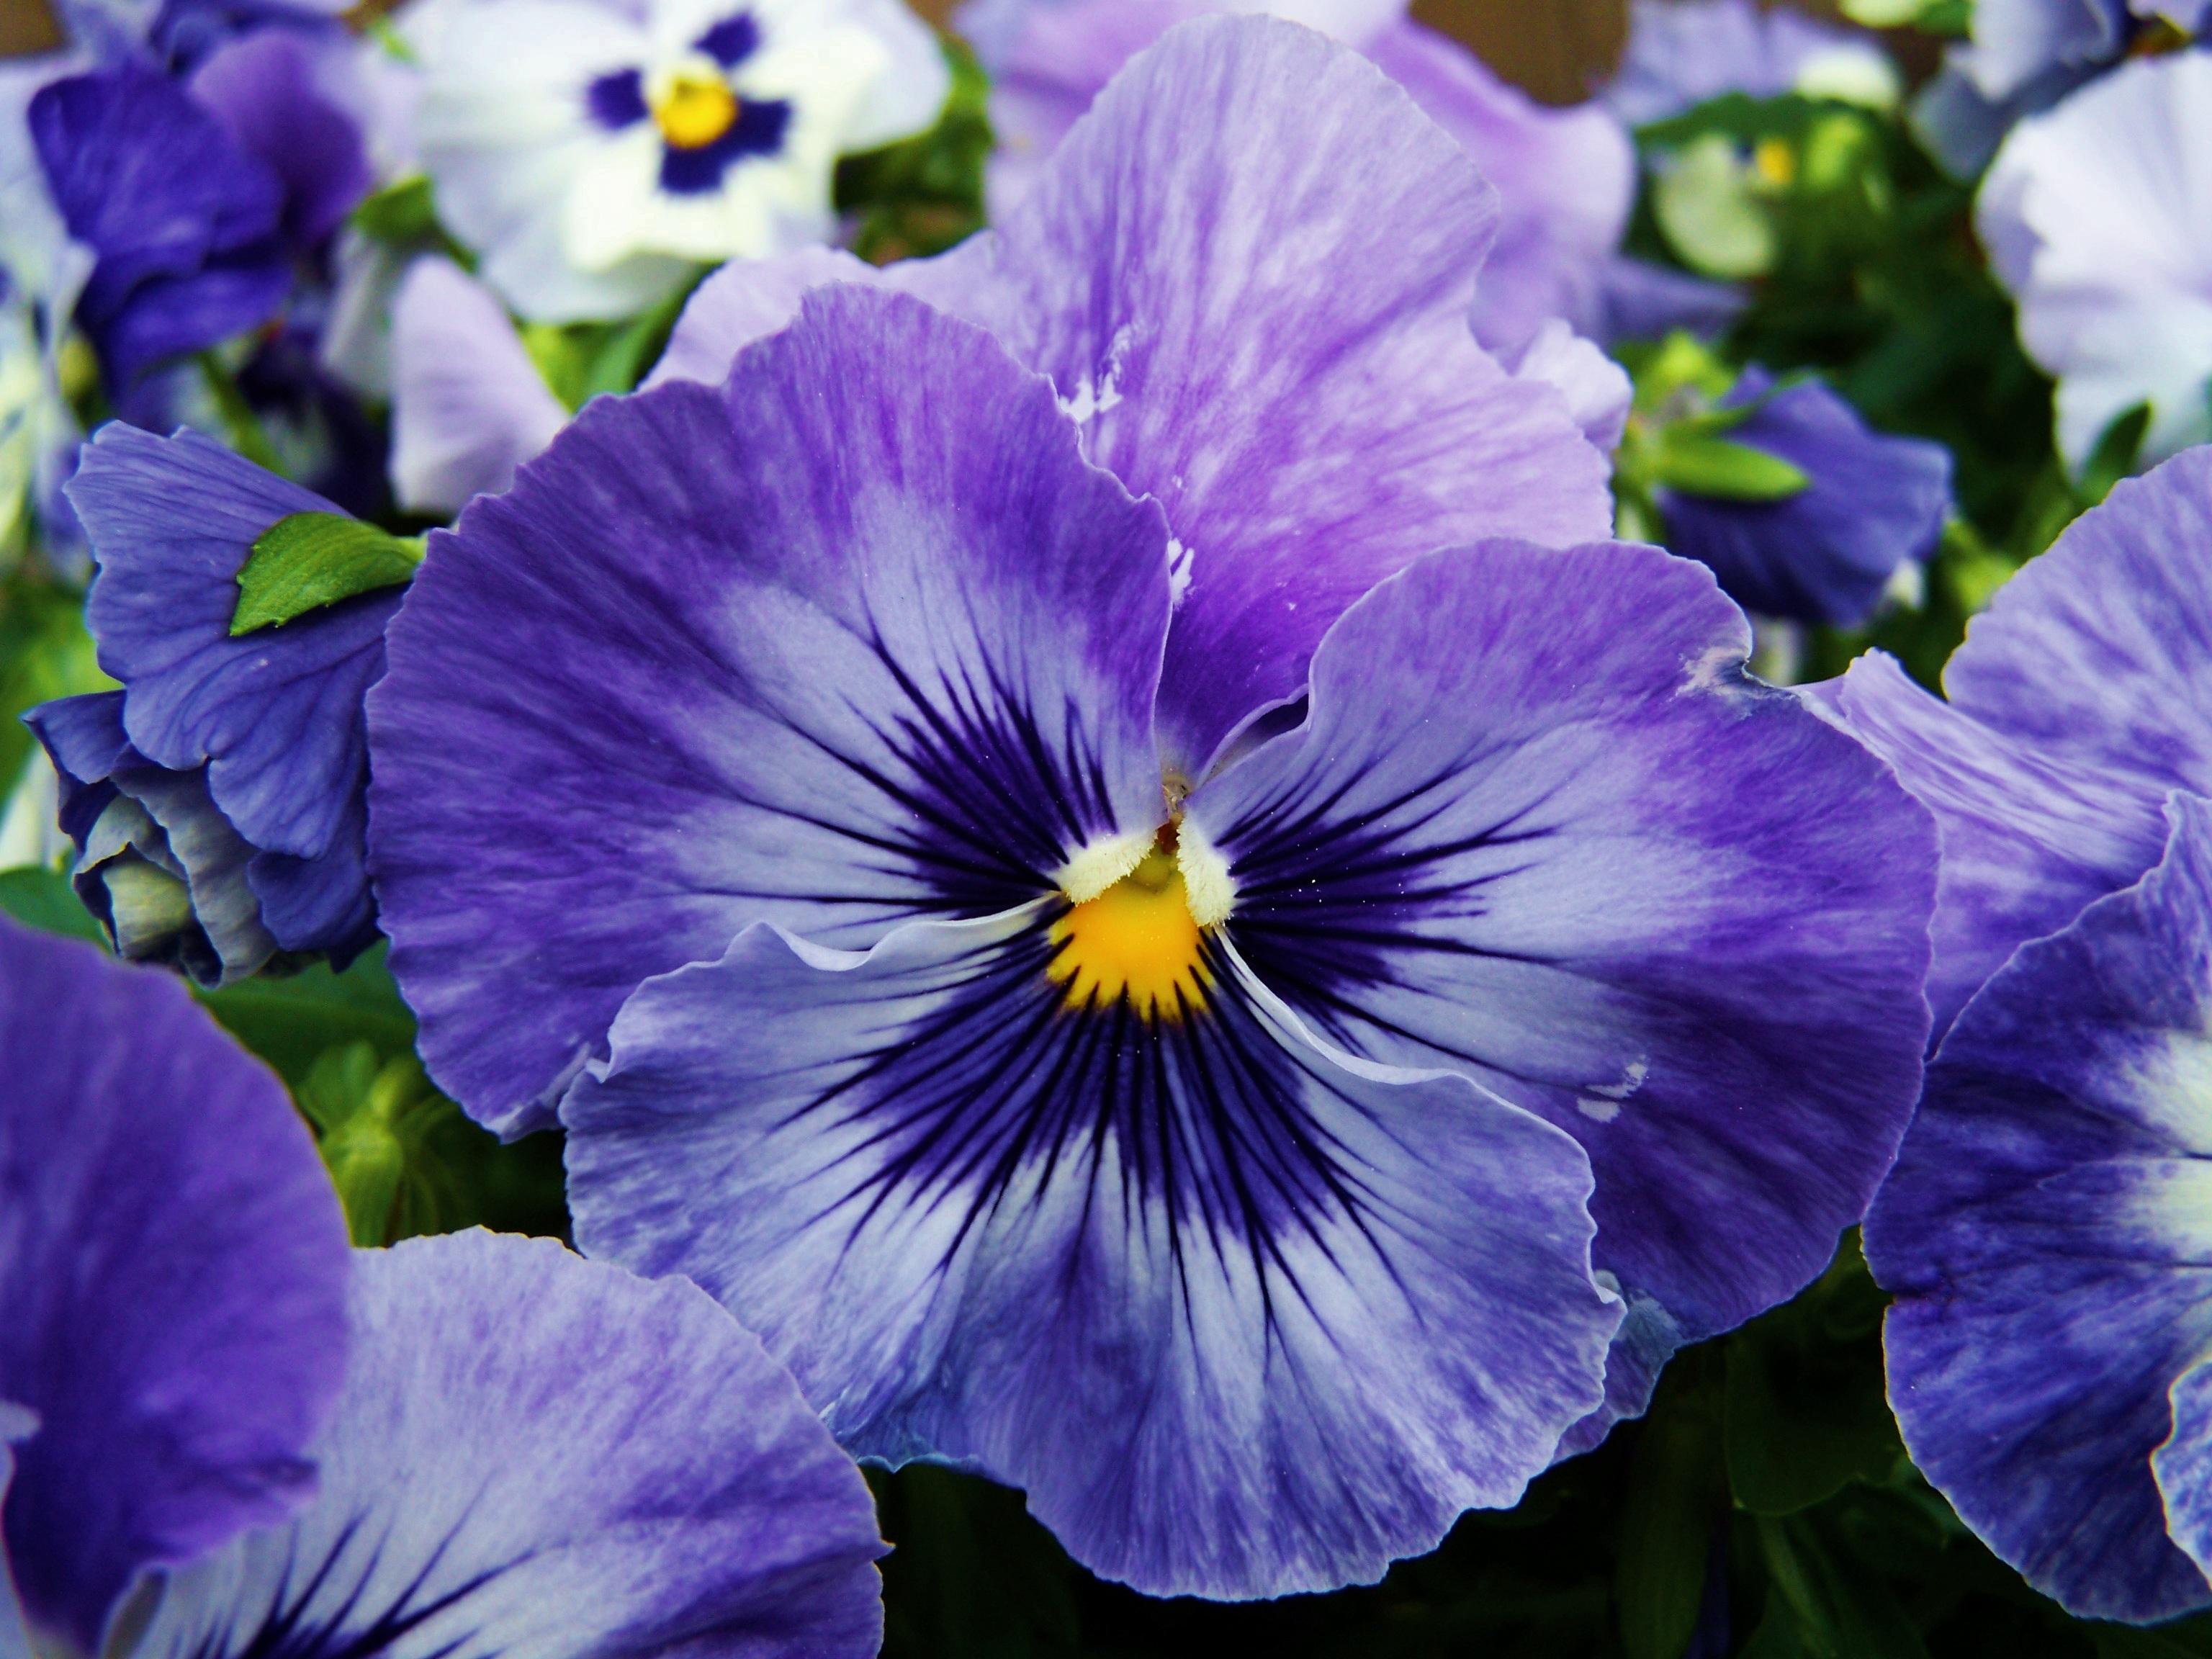 Free Images Petal Flora Iris Eye Flower Garden Spring Flower